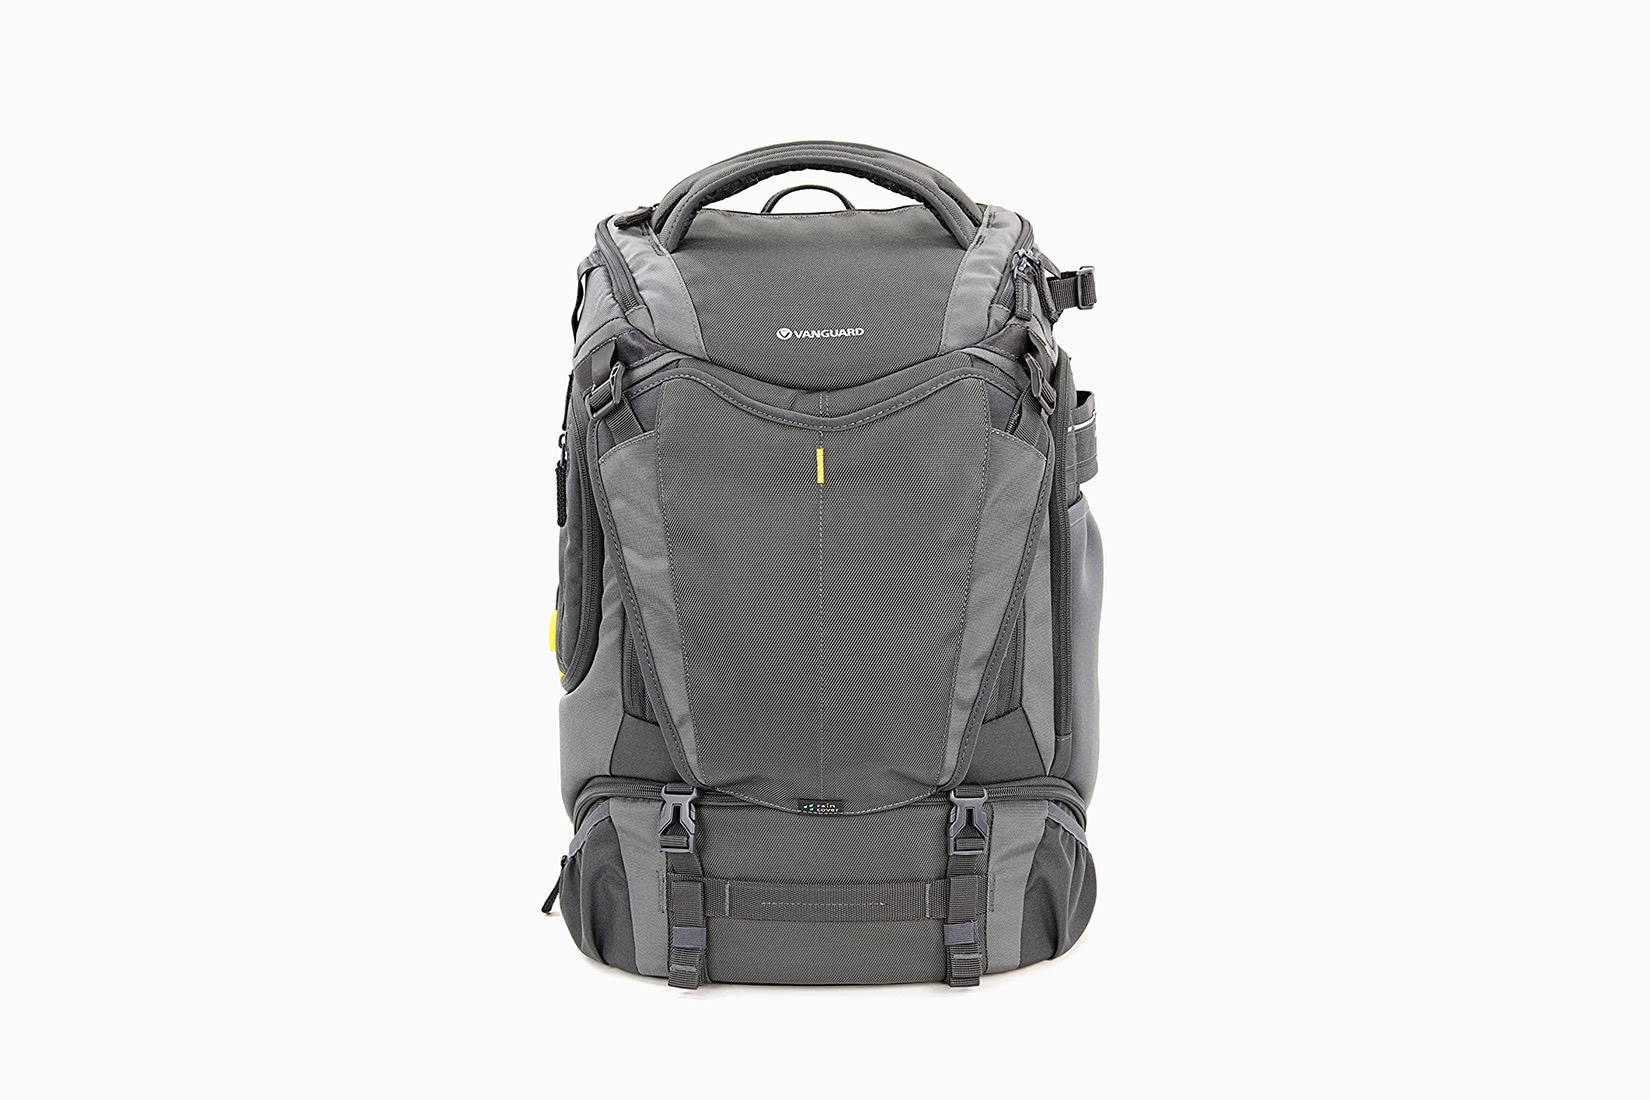 best camera backpacks vanguard alta sky 51D - Luxe Digital